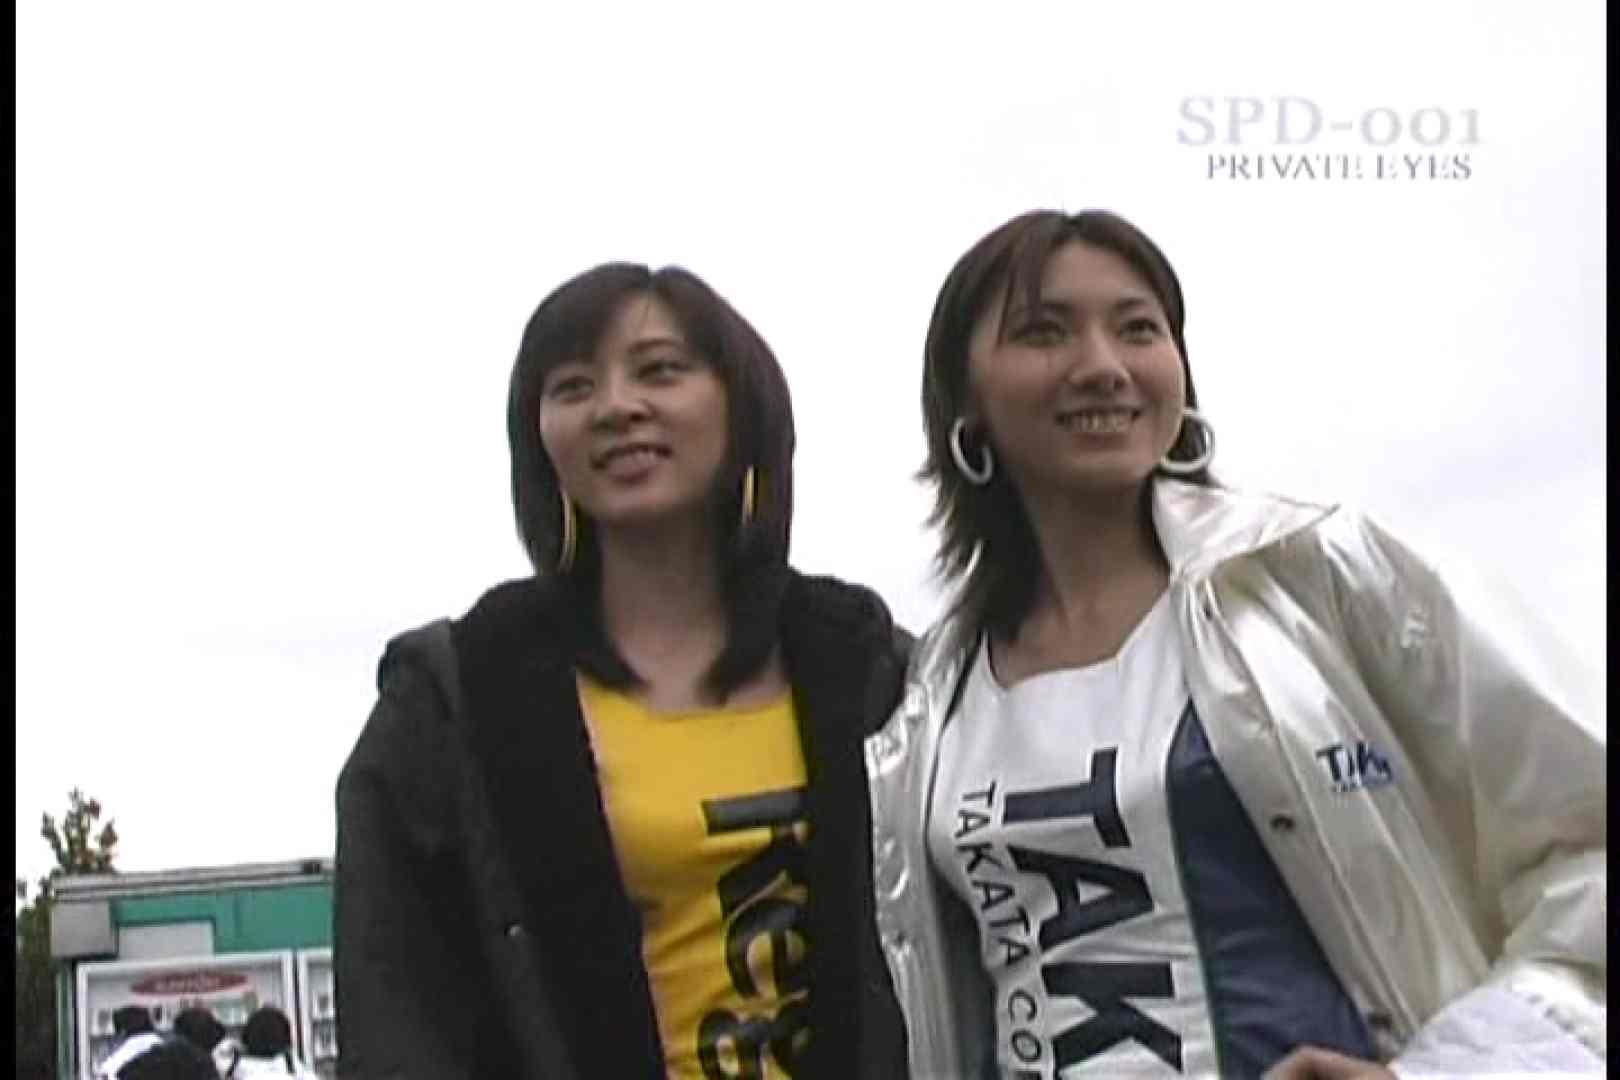 高画質版!SPD-001 サーキットの女神達 Vol.00 名作映像 | 高画質  109PIX 106